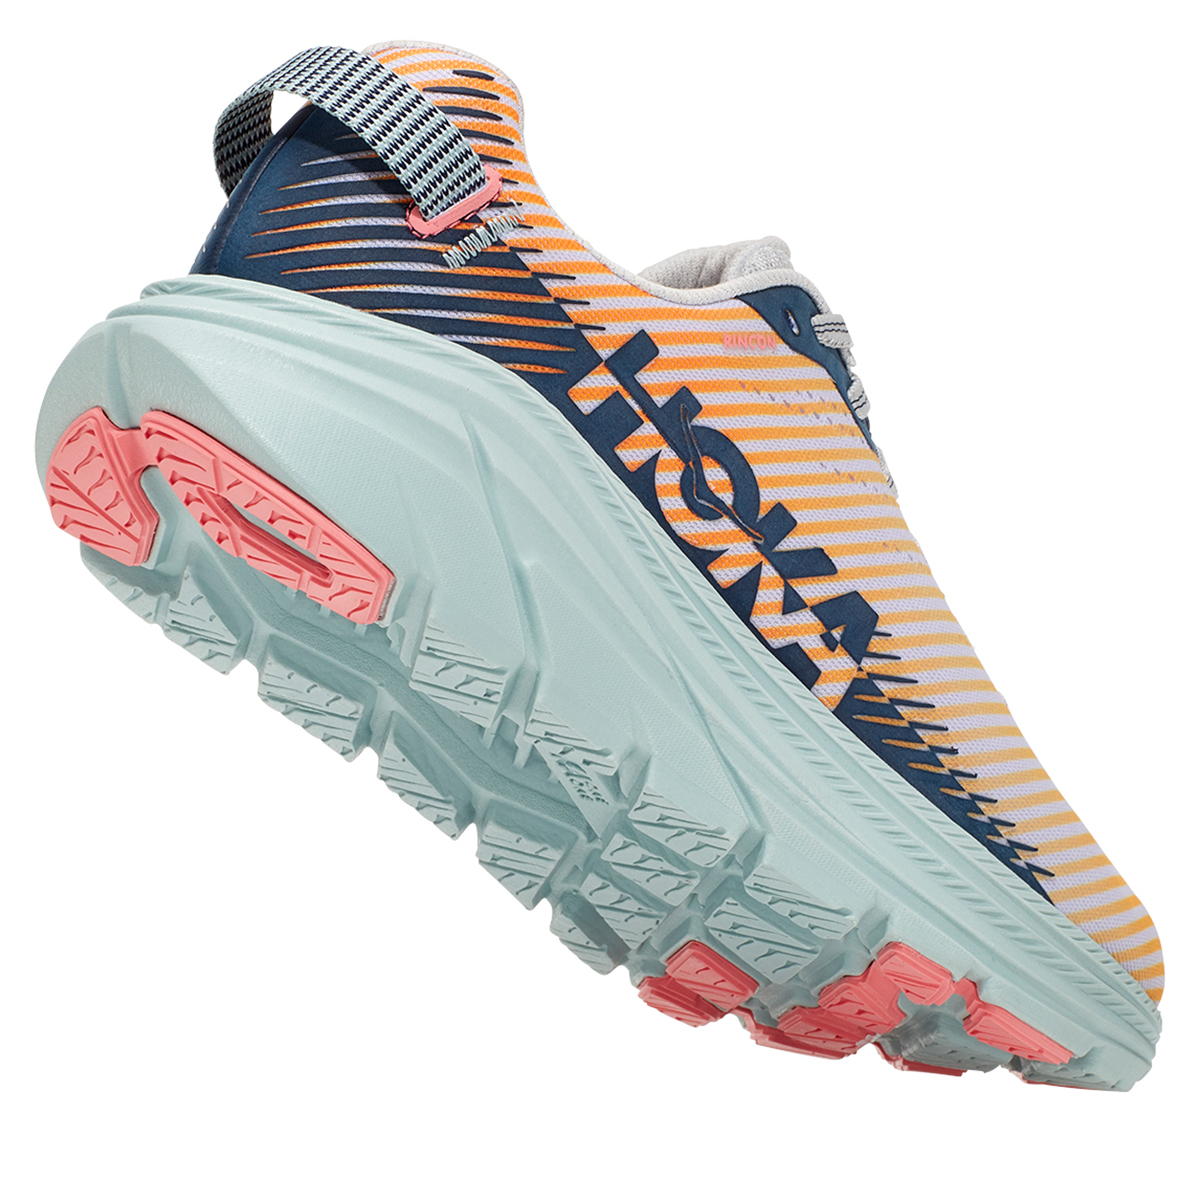 Women's Hoka One One Rincon 2 Running Shoe - Color: Lunar Rock/Black Iris - Size: 7 - Width: Regular, Lunar Rock/Black Iris, large, image 5